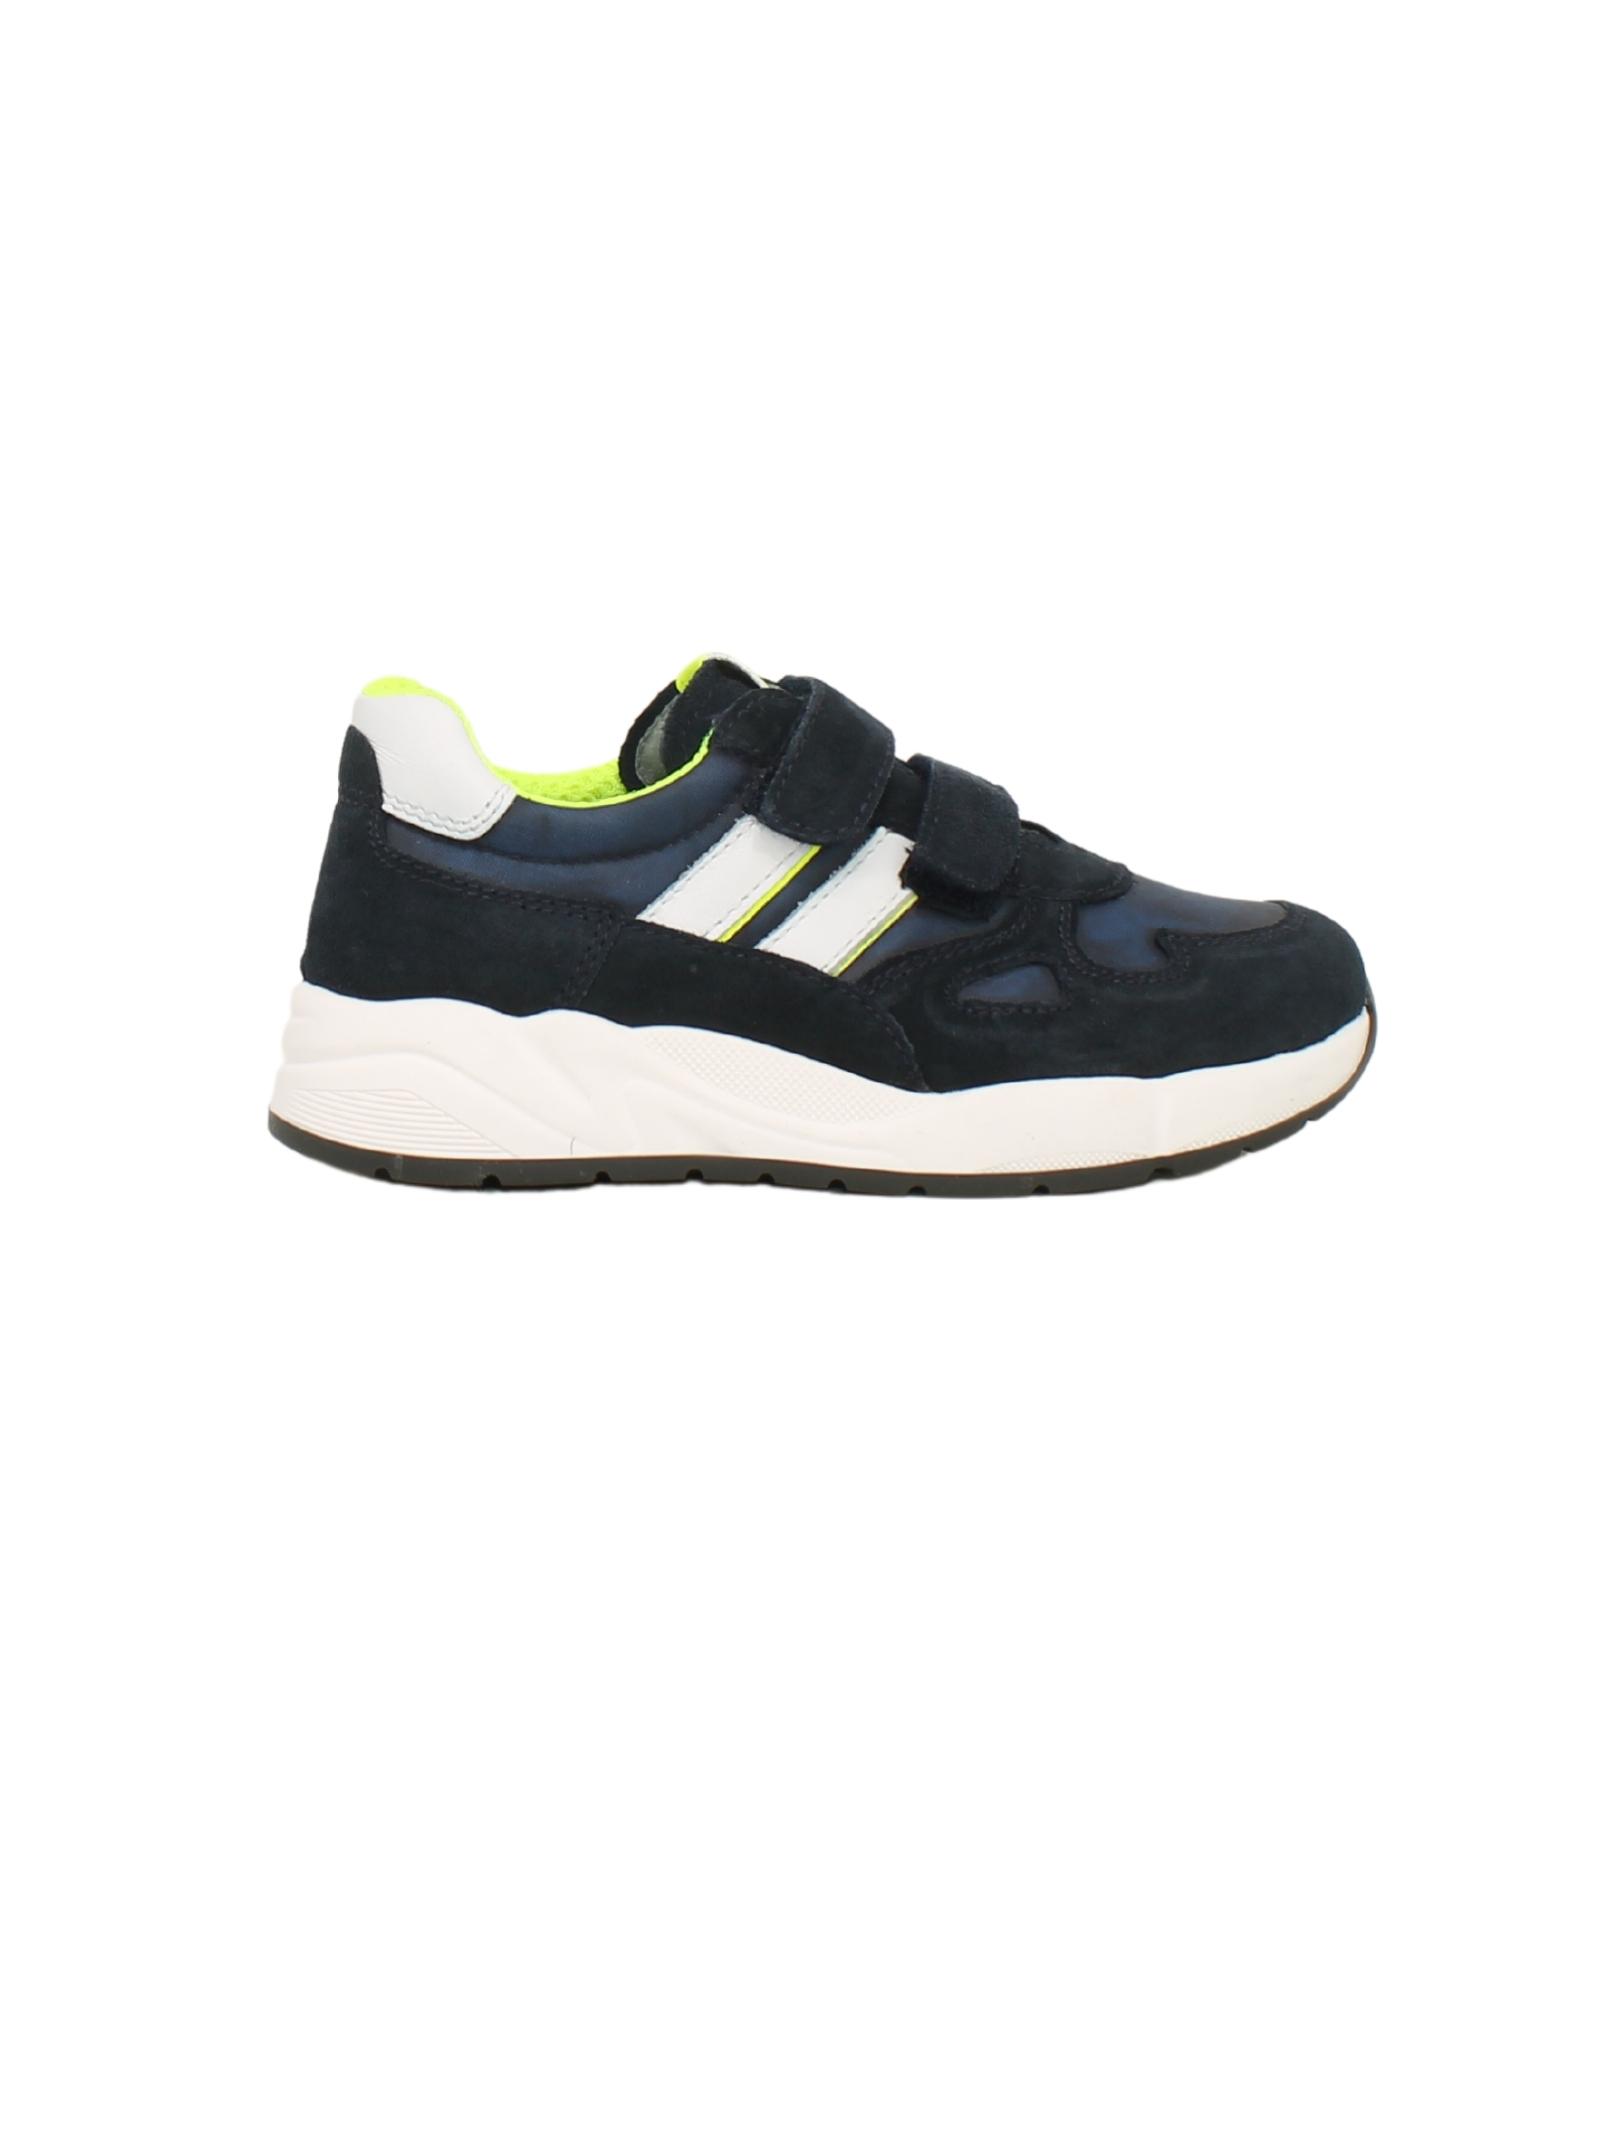 Sneakers Fluo Lime Bambino NERO GIARDINI JUNIOR   Sneakers   023910M207